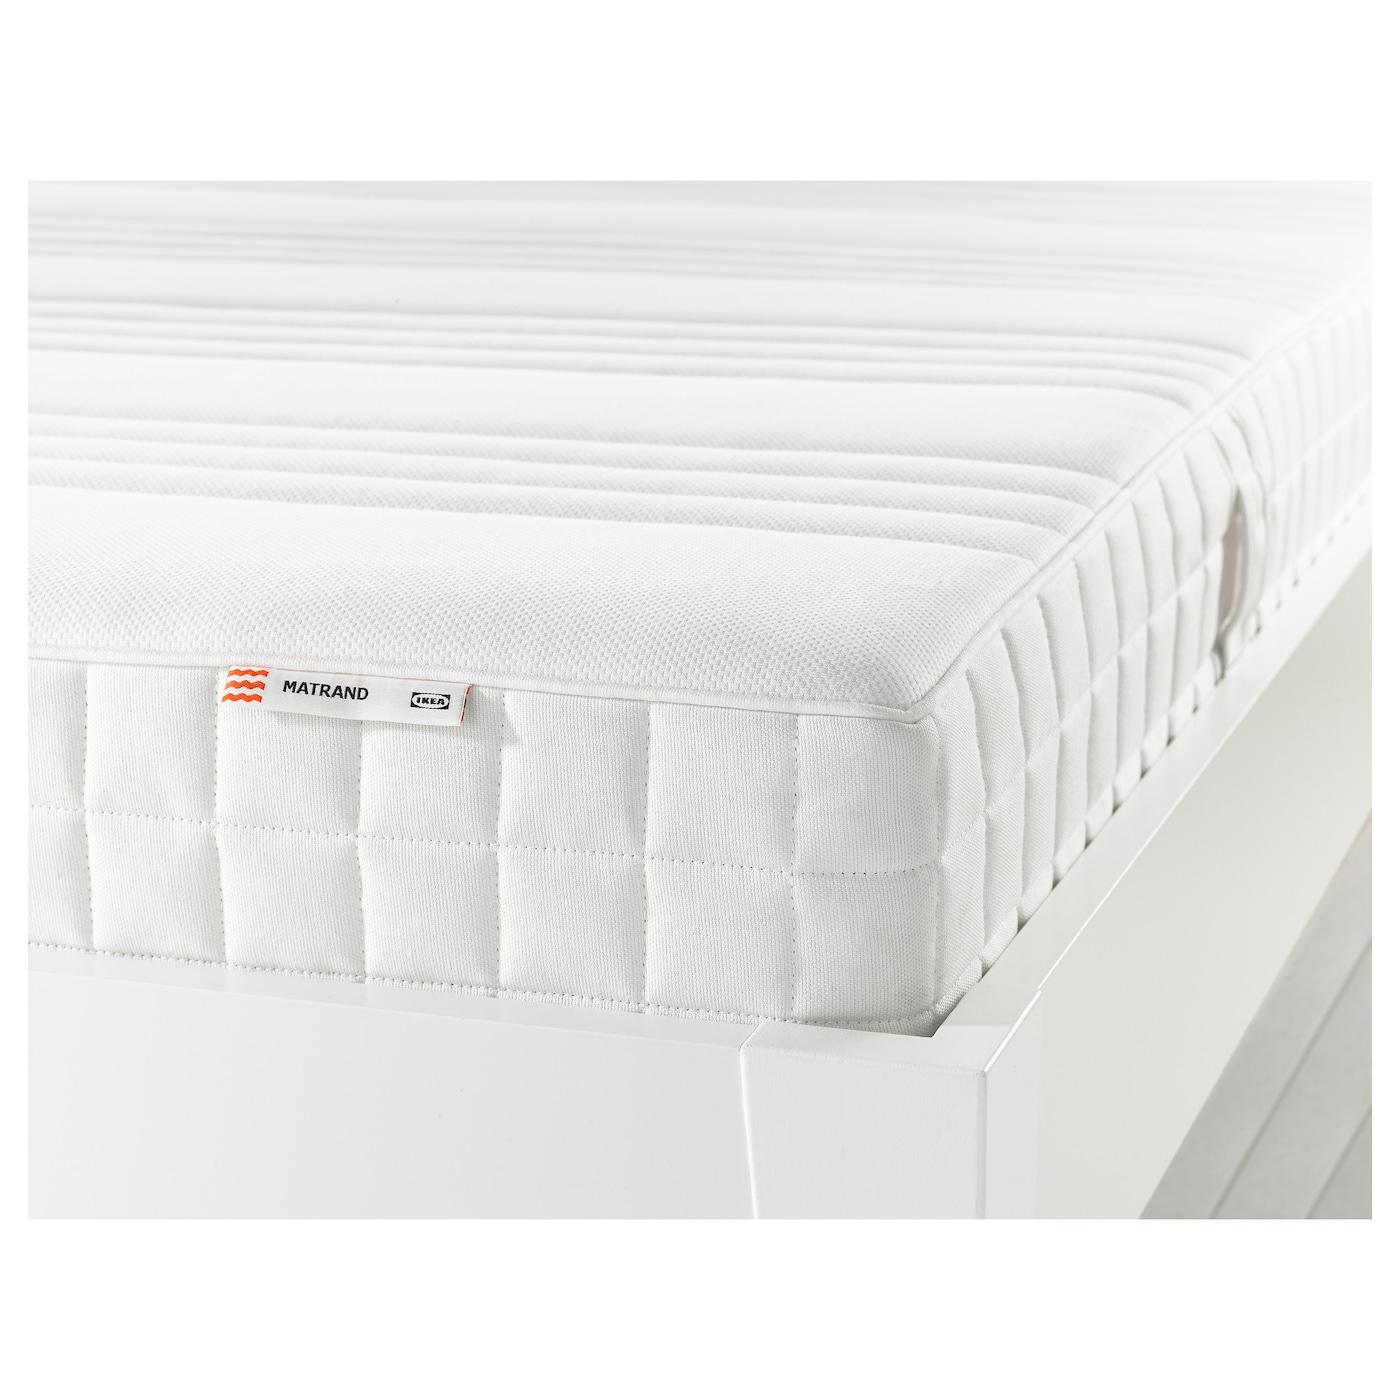 matrand matelas latex mi ferme blanc 80x200 cm ikea. Black Bedroom Furniture Sets. Home Design Ideas